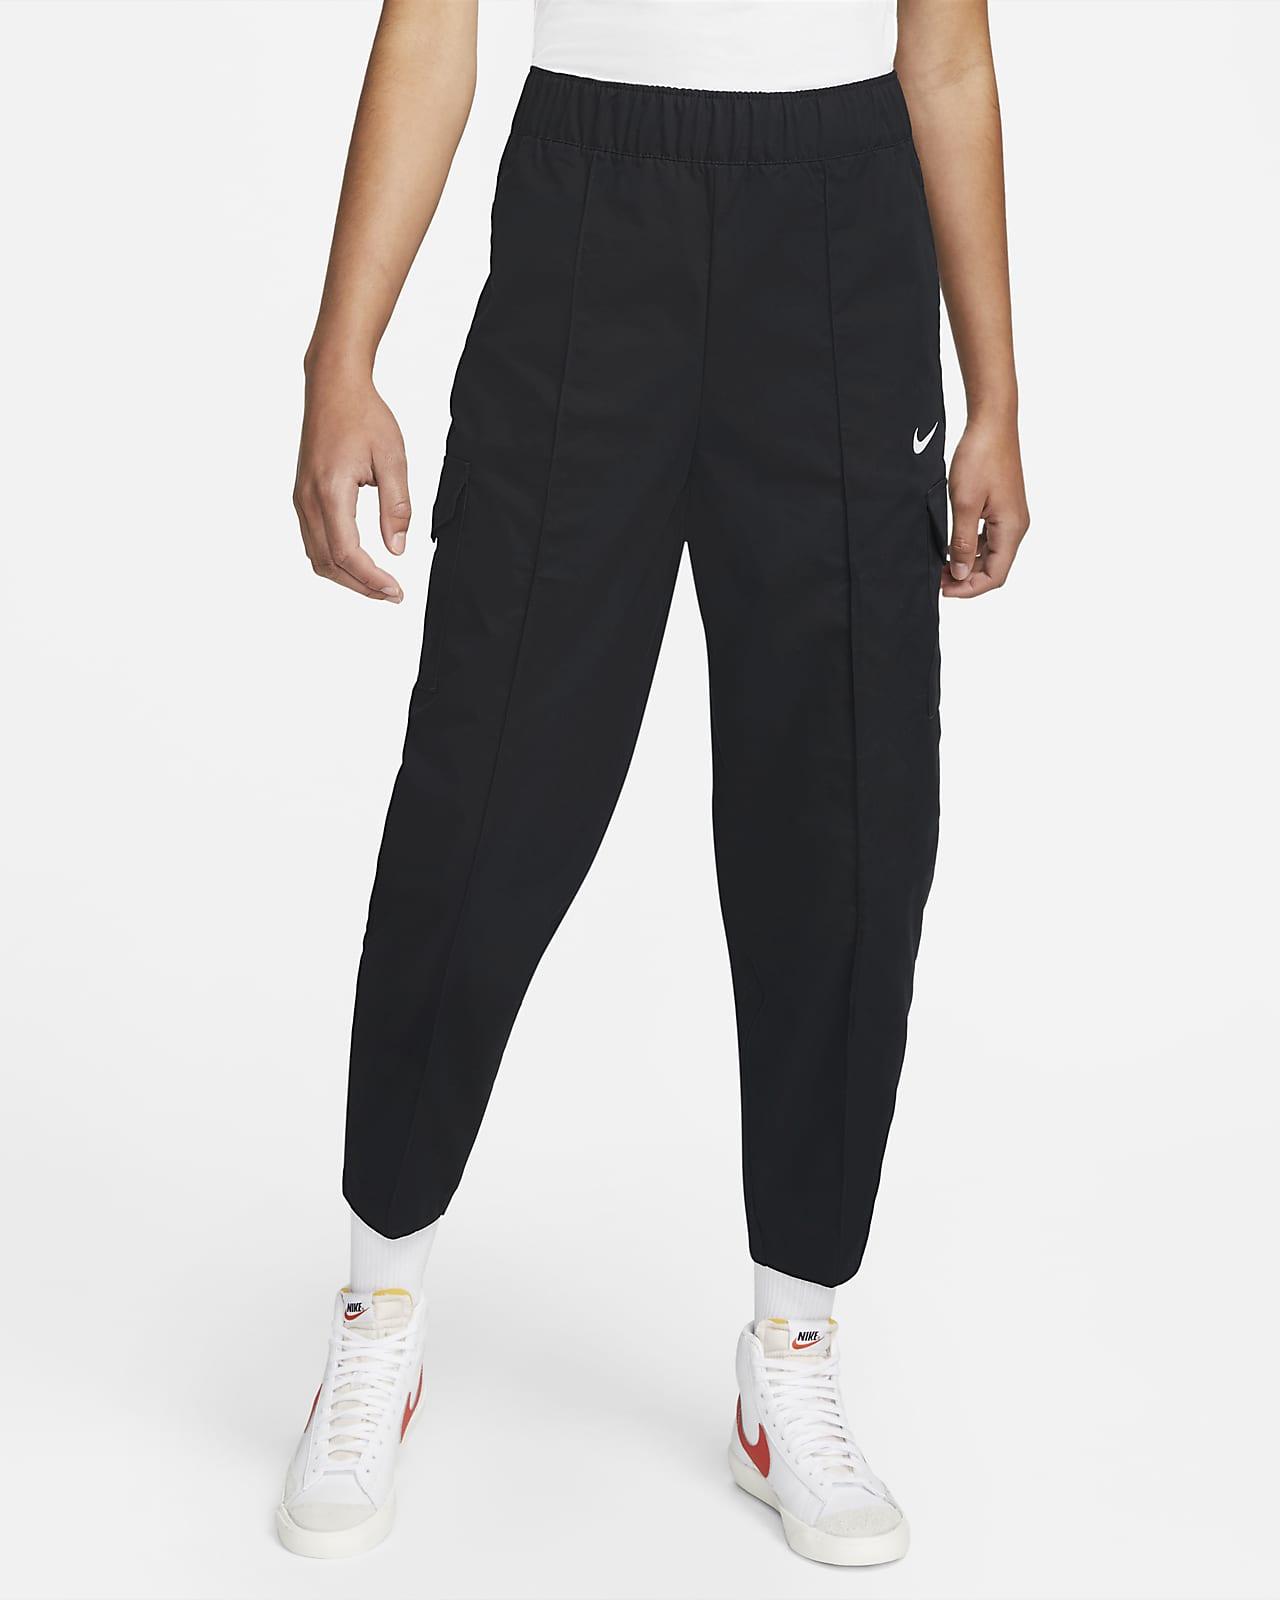 Nike Sportswear Essentials Women's Curve Woven High-Rise Pants